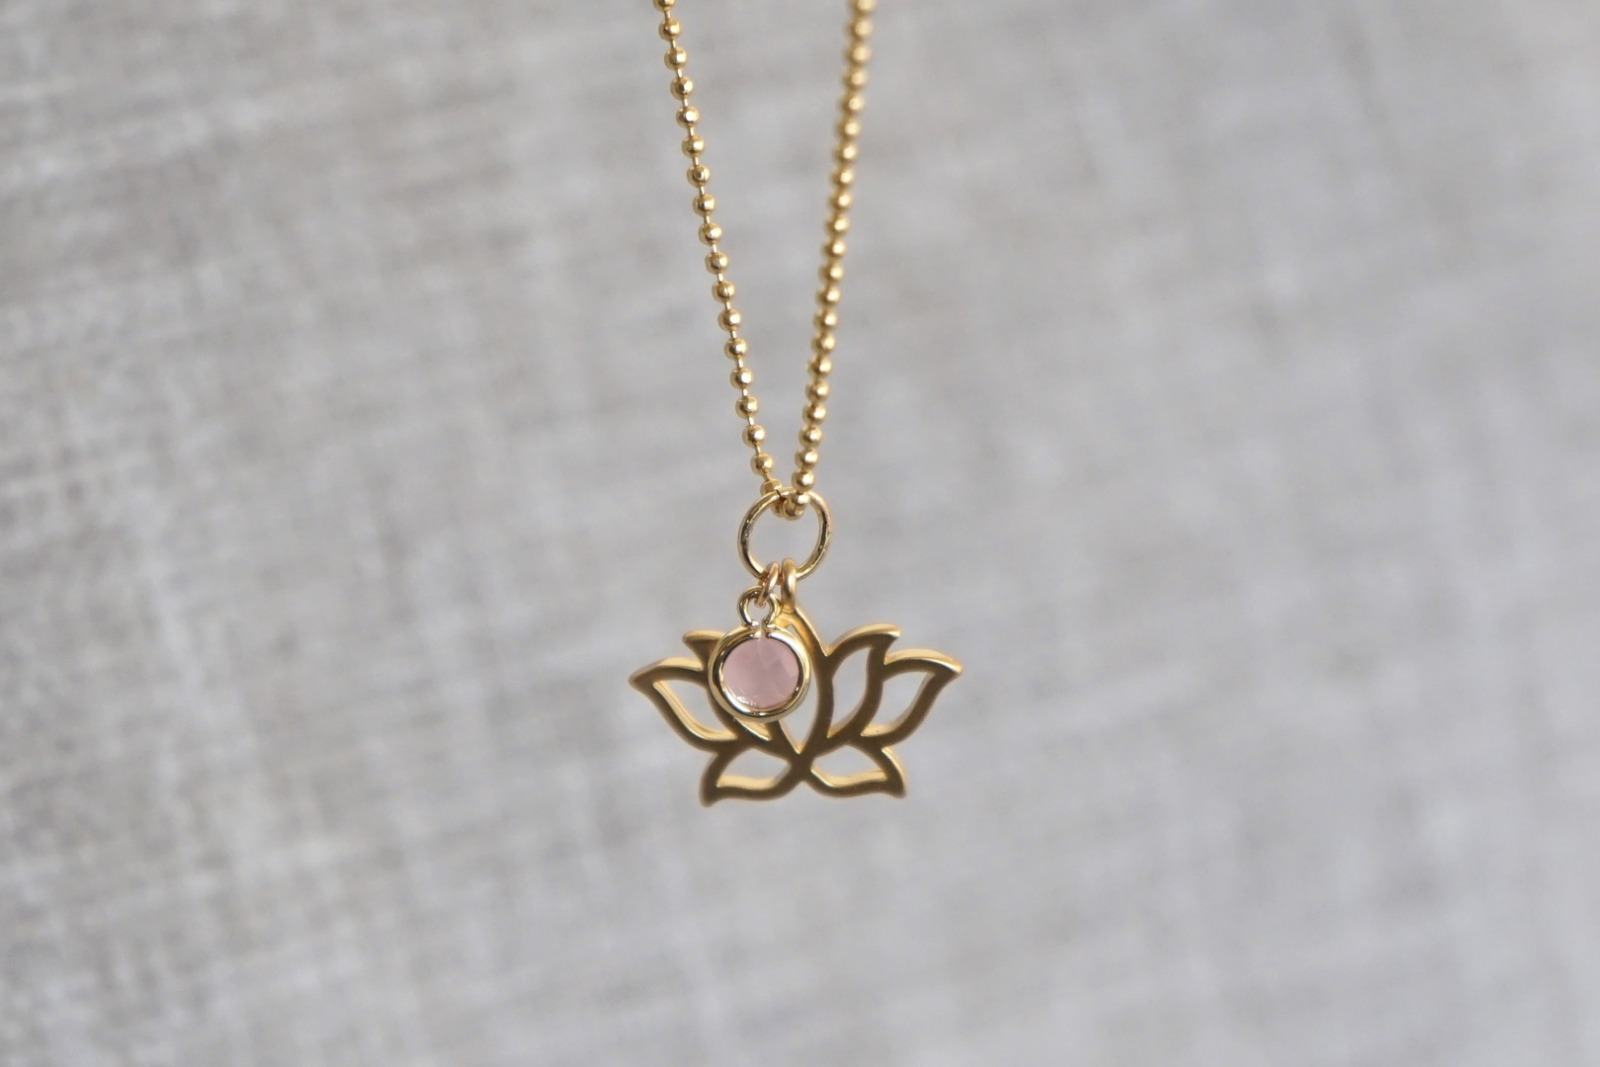 Kugelkette mit Lotusblüte und Kristall rosa - 2